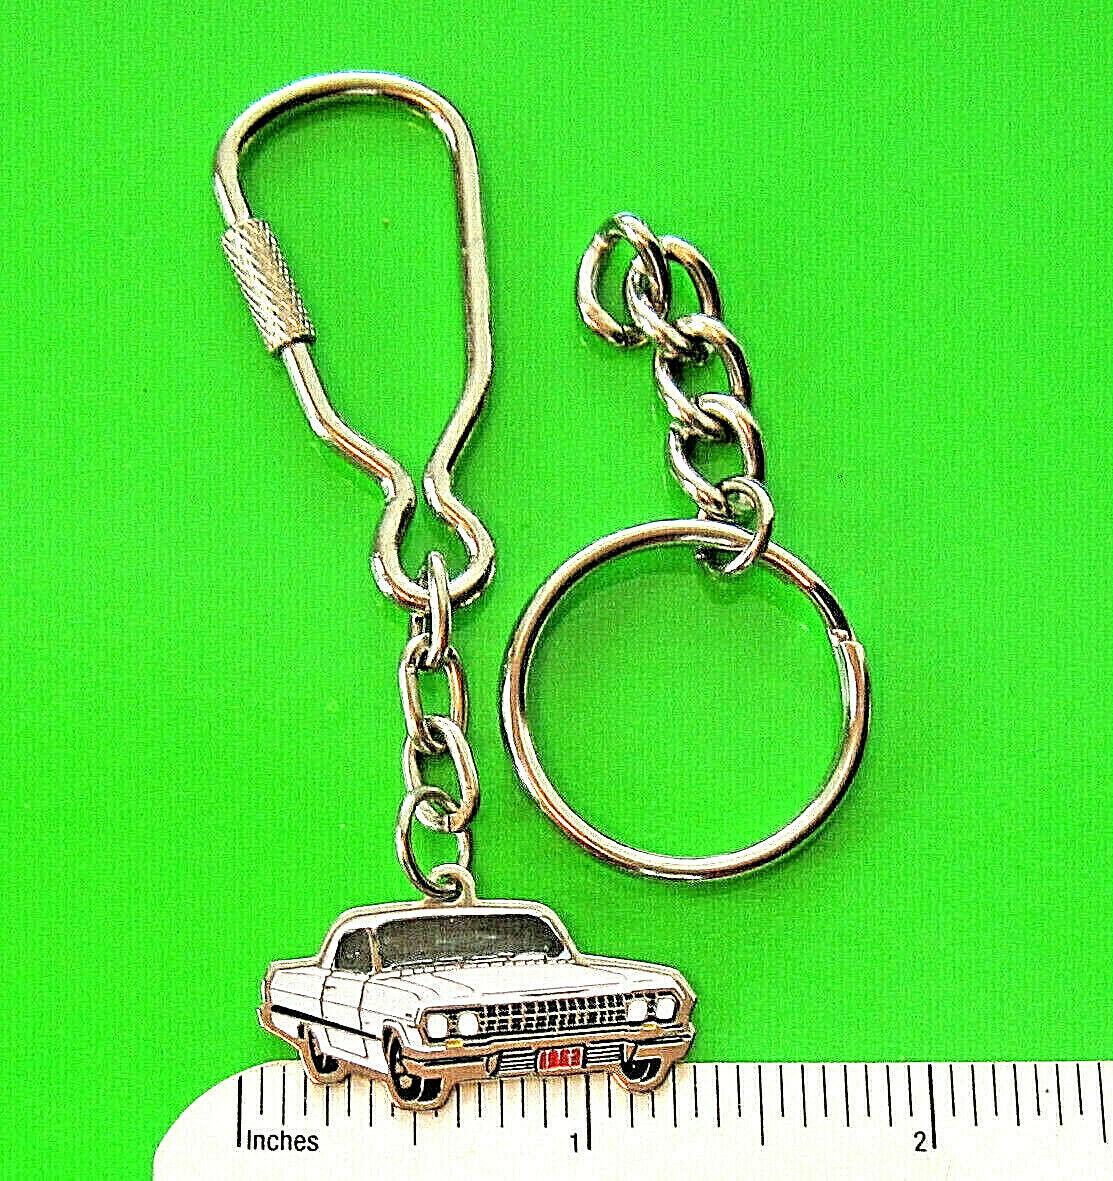 Big-Block engine Muscle Car Cute Car keychain Sleutelhanger Boyfriend   keychain,gift BAE gift Chevy Impala keychain 1961